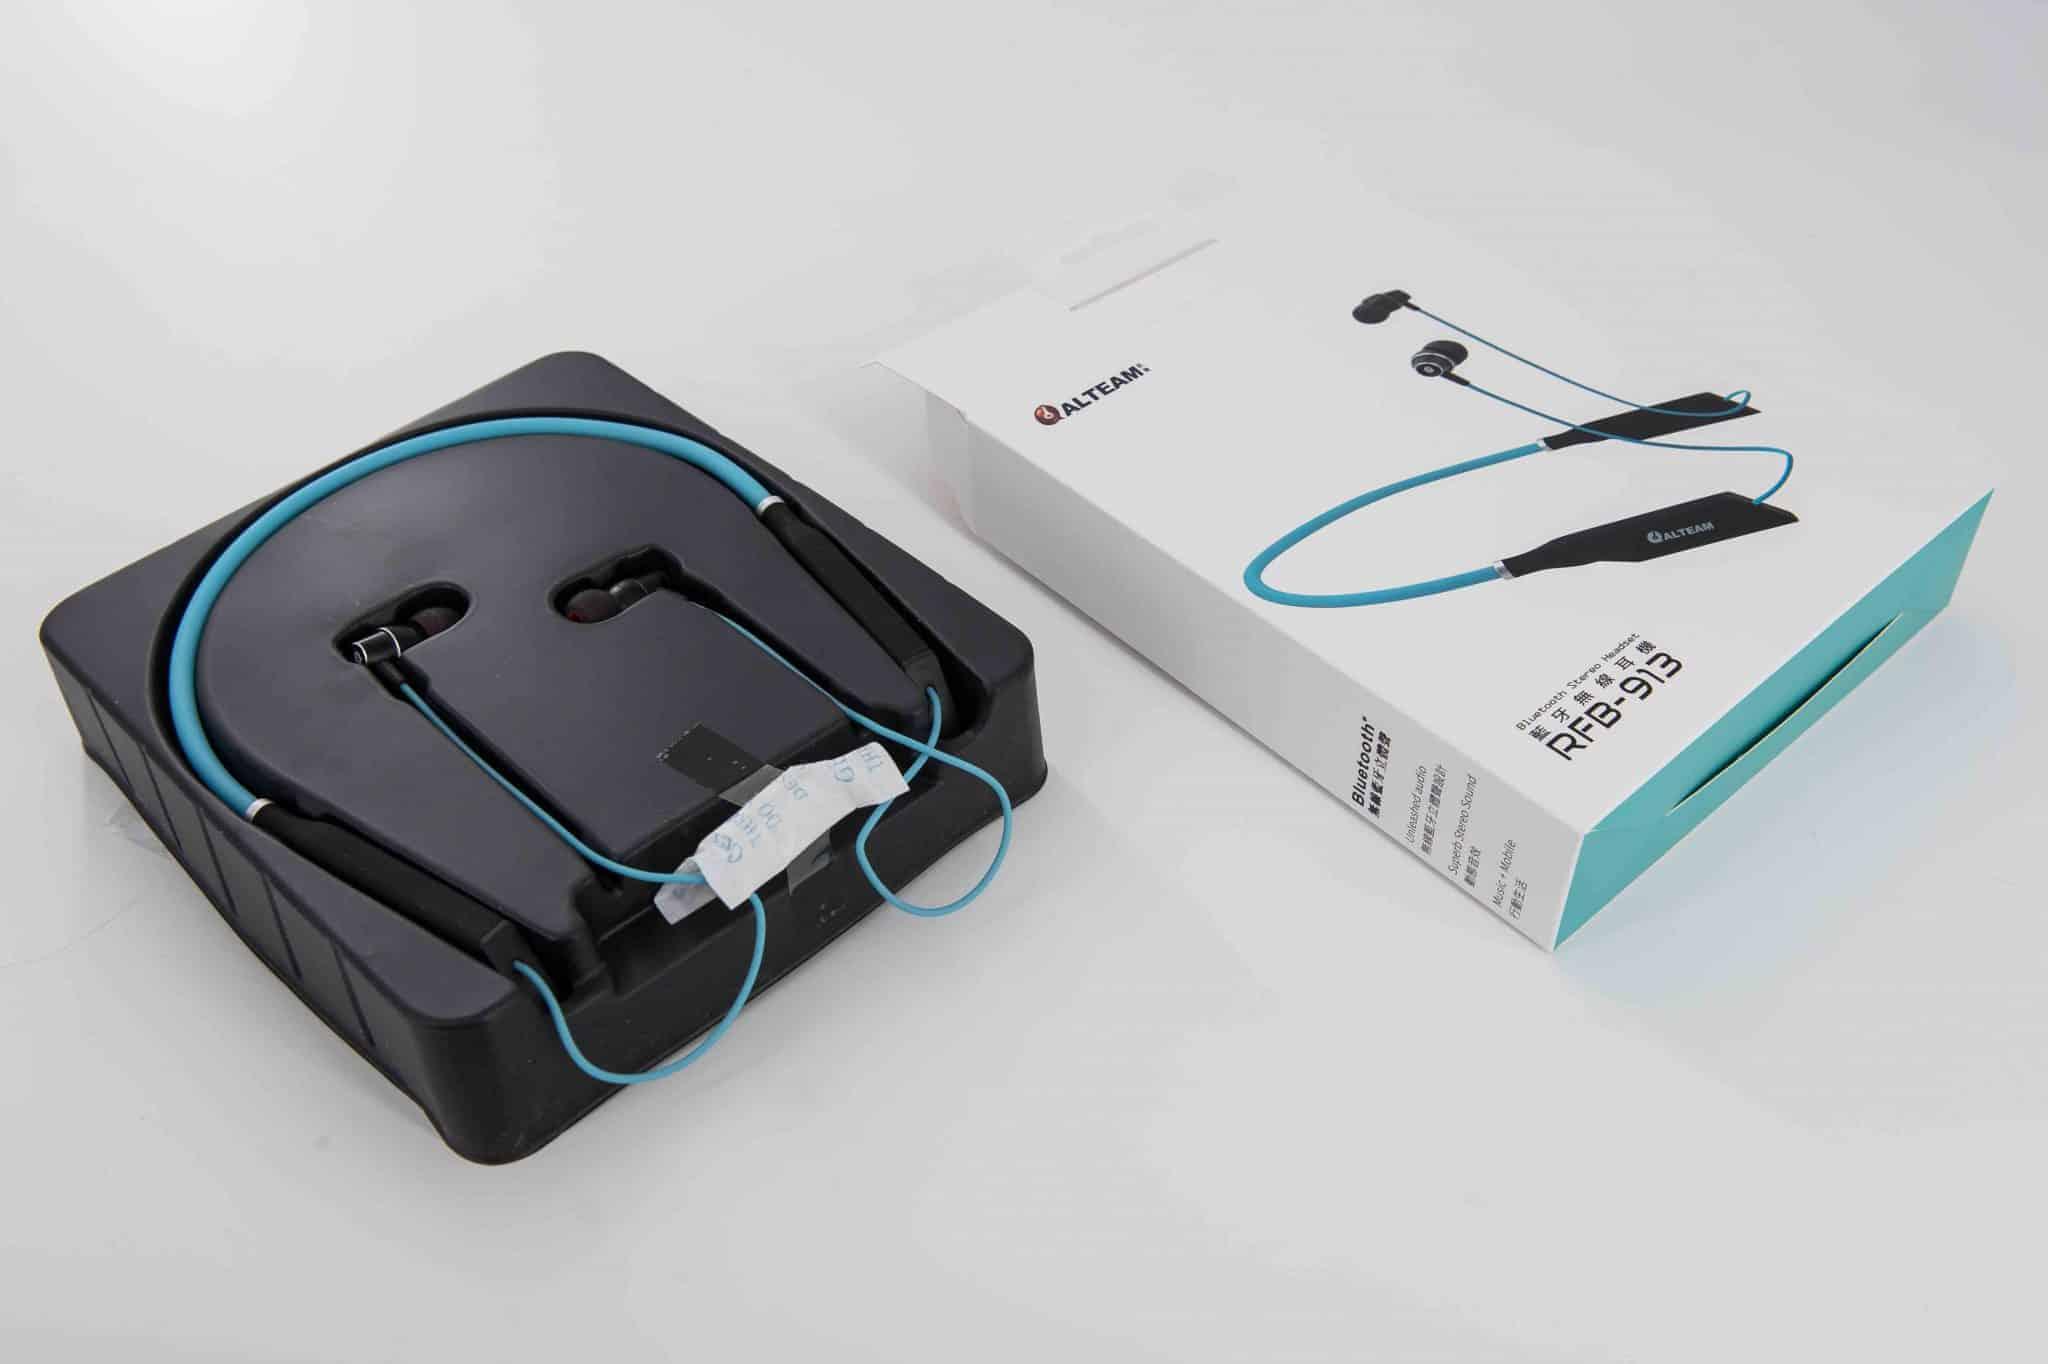 Alteam RFB-913 頸掛式藍牙耳機開箱評測-TechTeller (科技說)